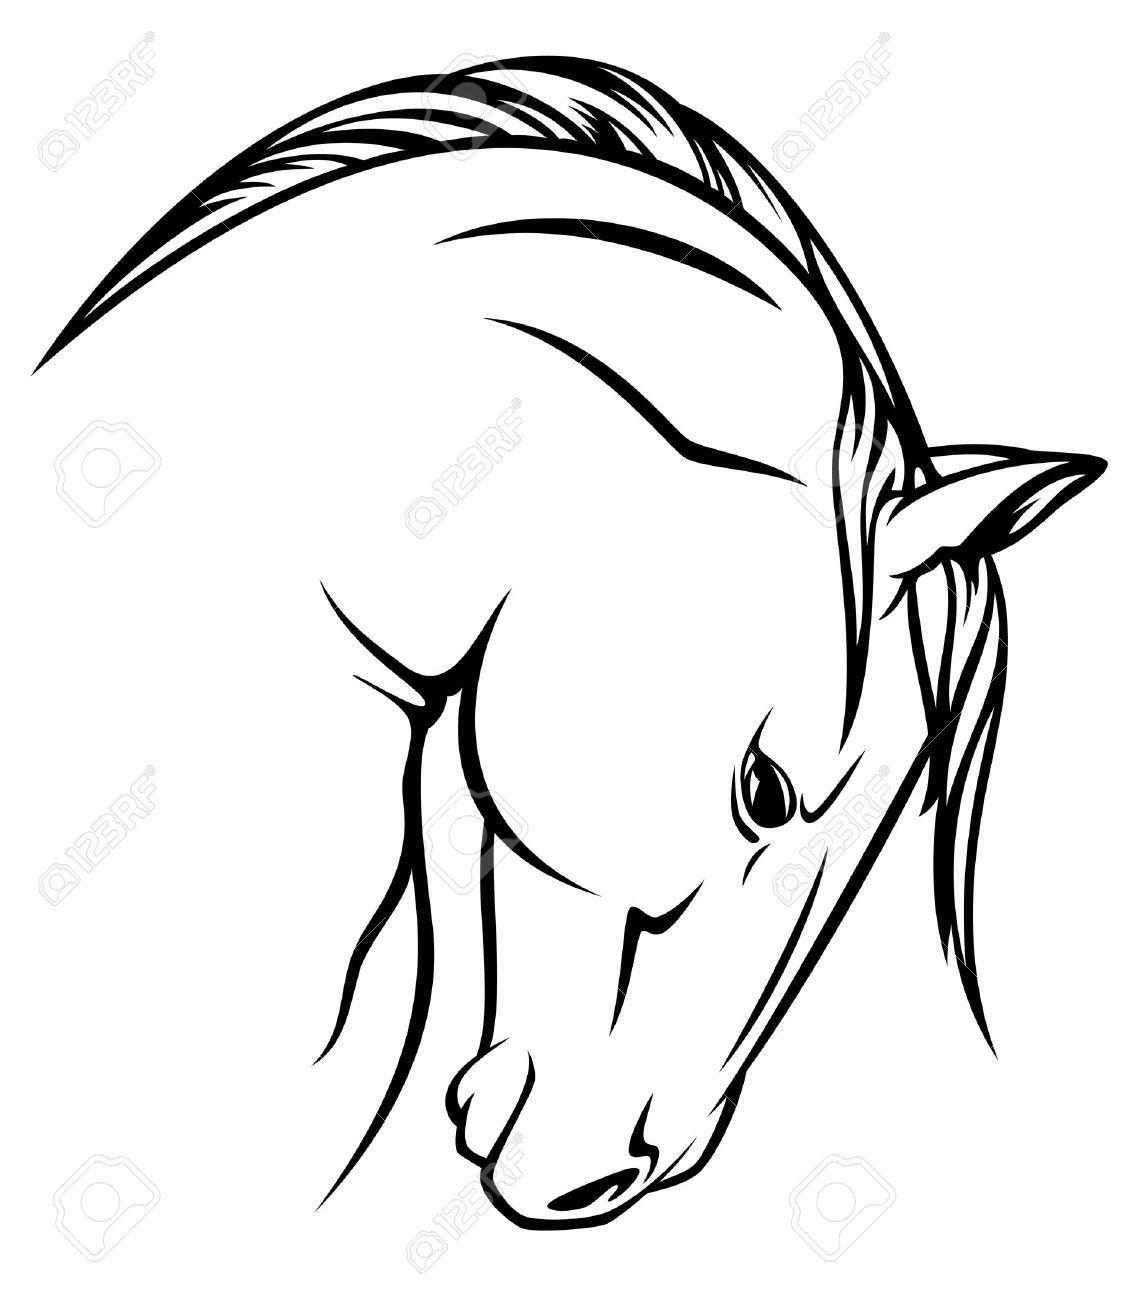 1124x1300 Stock Vector Zentangle Horse Profile, Horse Outline, Outline